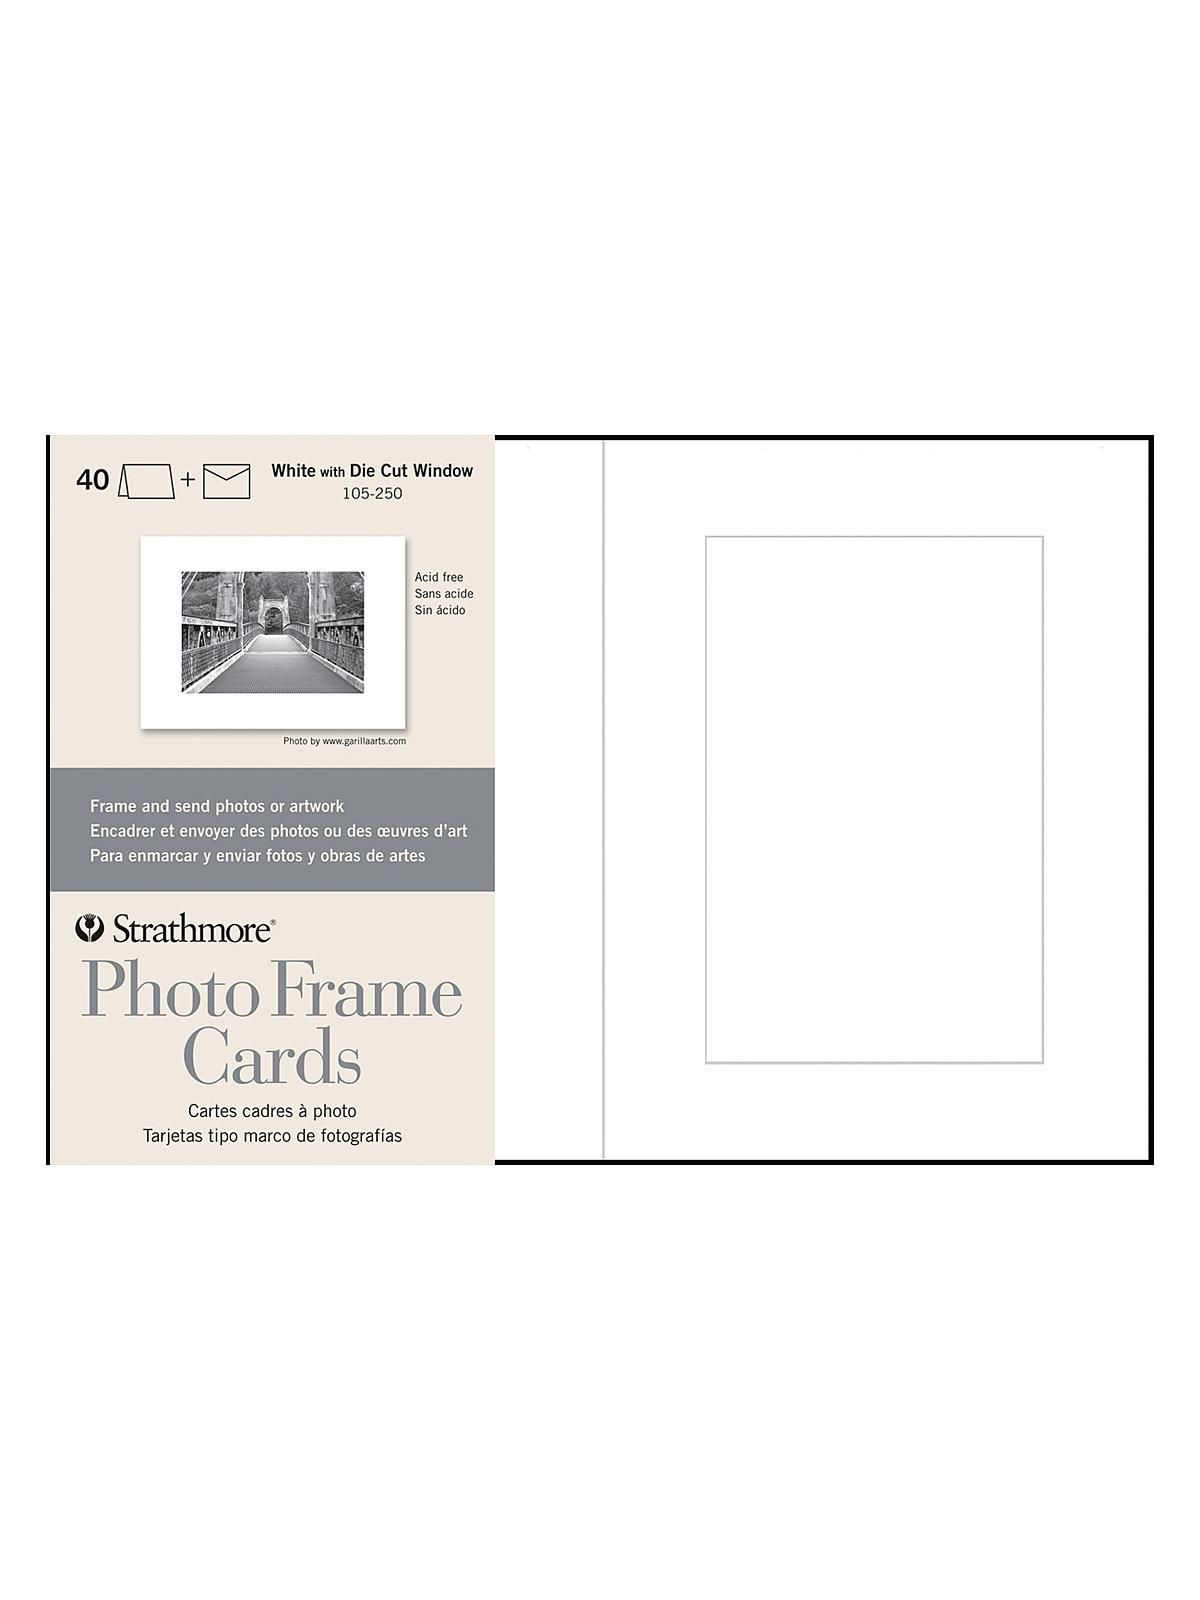 Strathmore - Photoframe Greeting Card